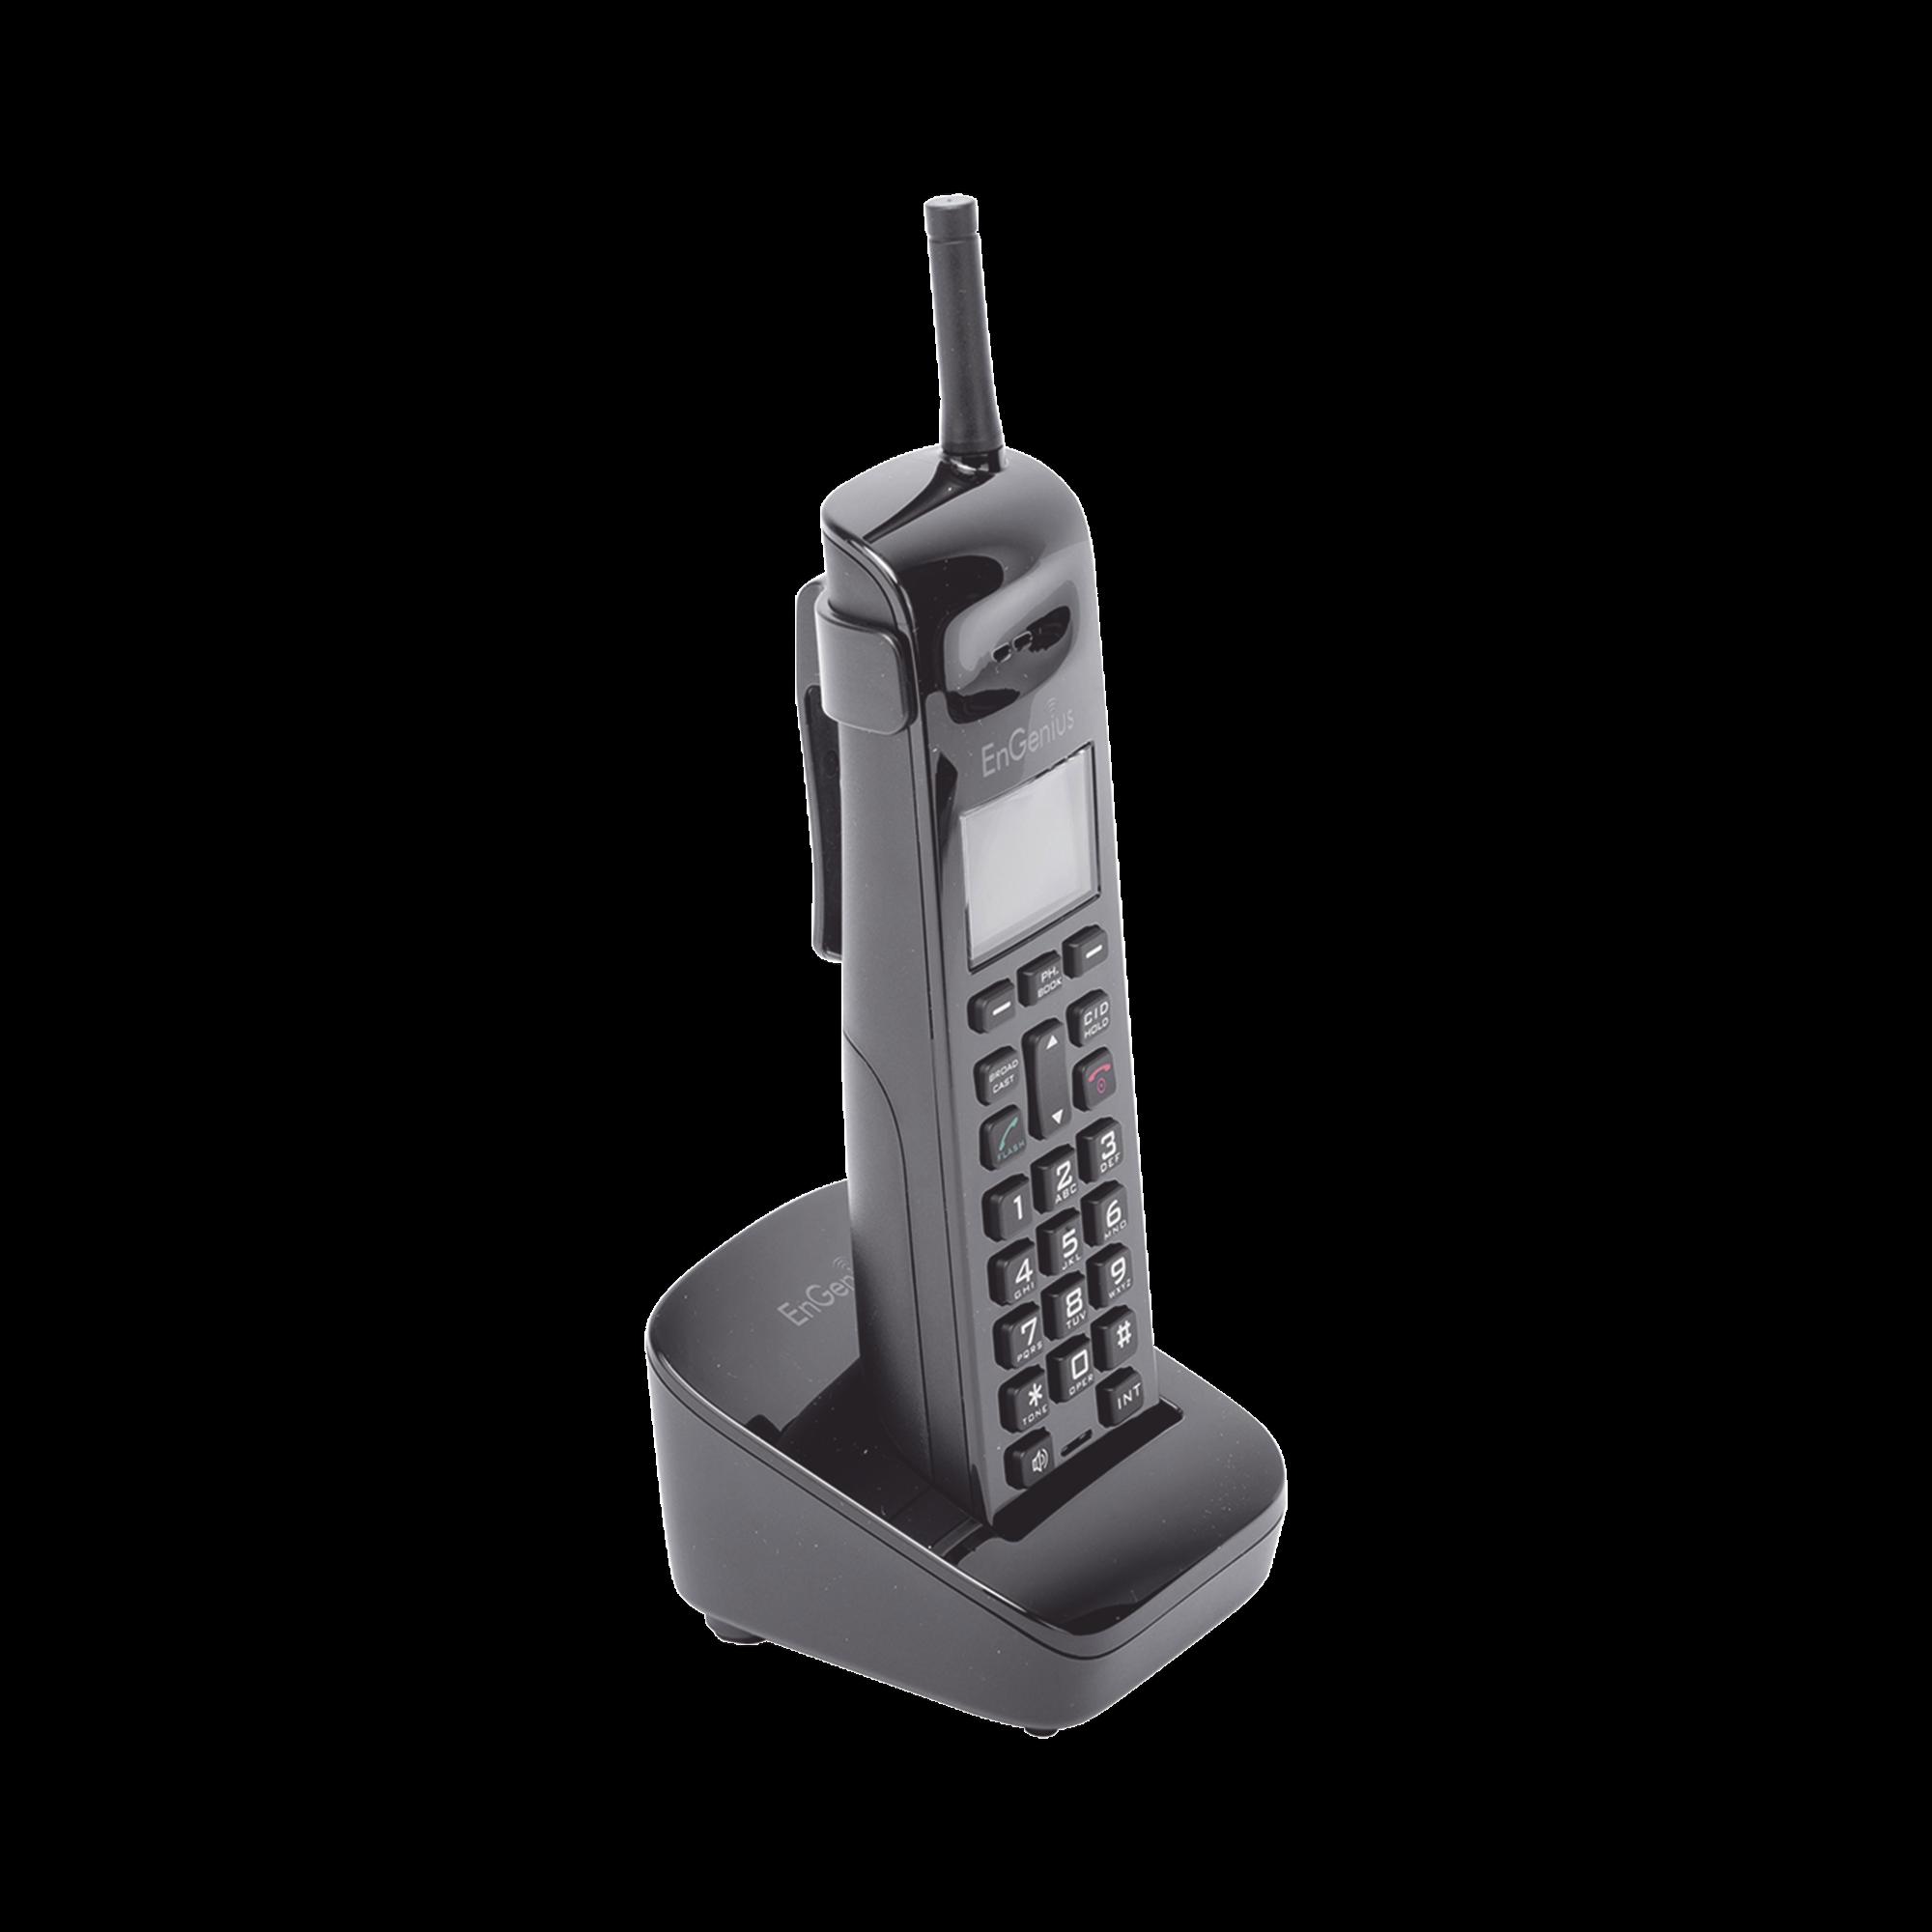 Teléfono de Largo Alcance compatible para Sistemas FreeStyl 2